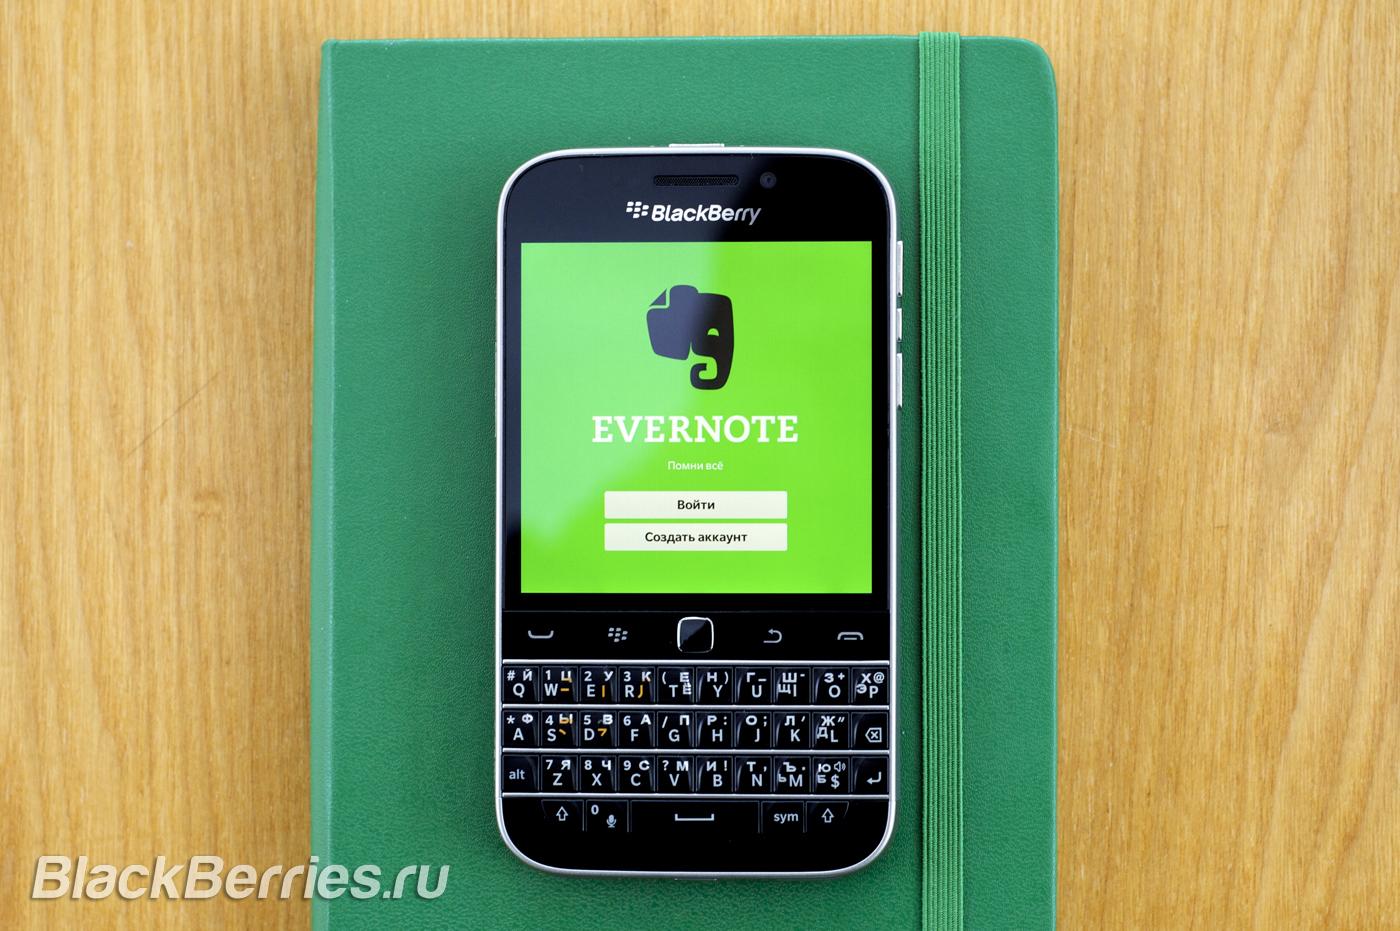 BlackBerry-Classic-Evernote